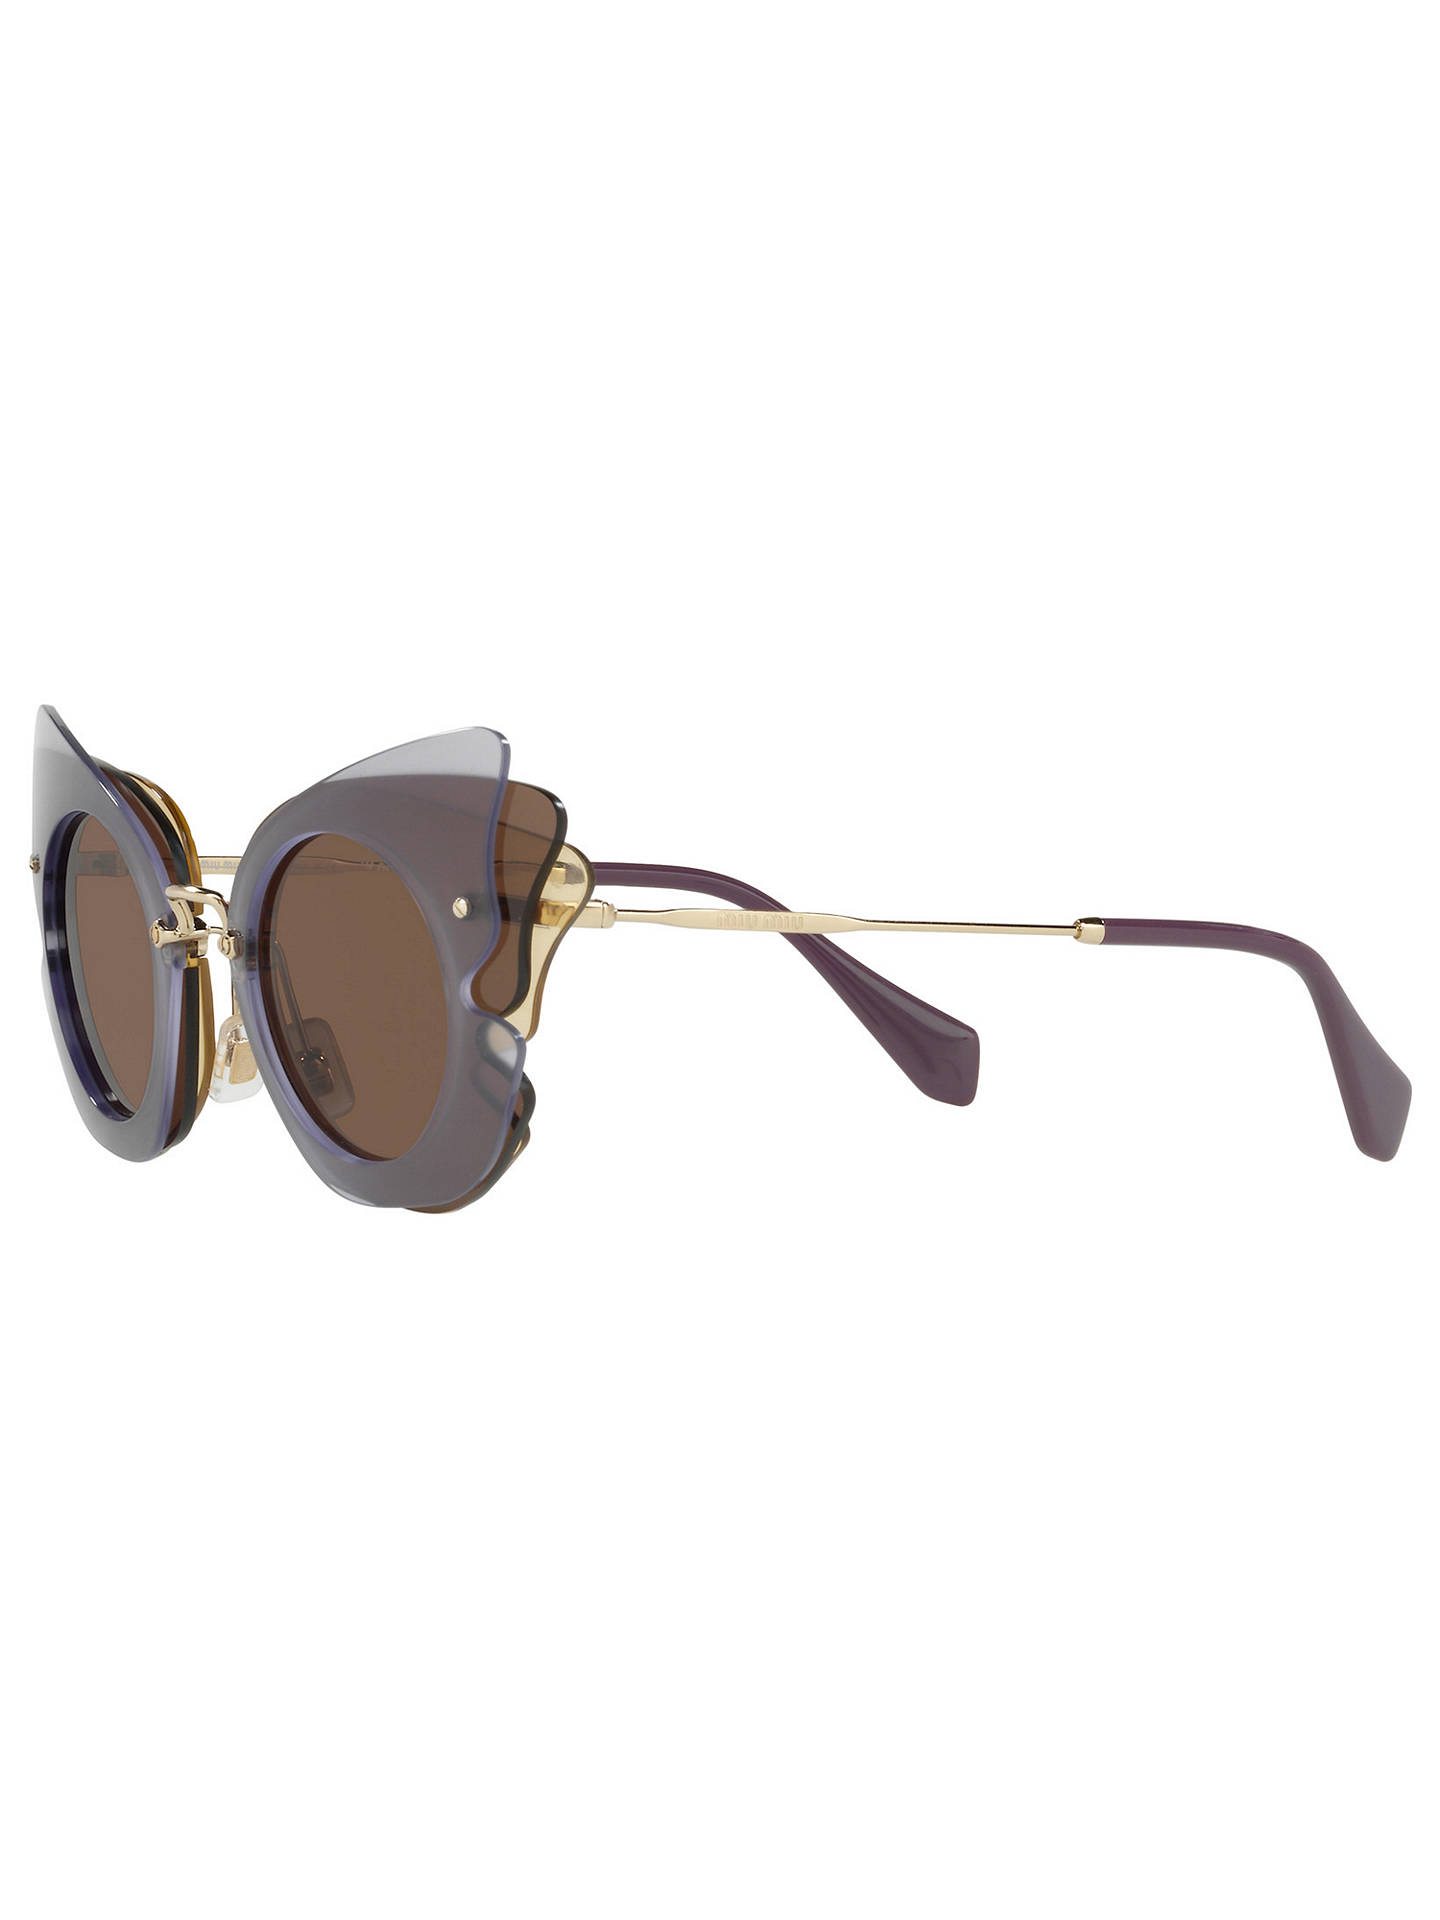 241e3675119f ... Buy Miu Miu MU 02SS Triple Butterfly Frame Sunglasses, Multi/Brown  Online at johnlewis ...